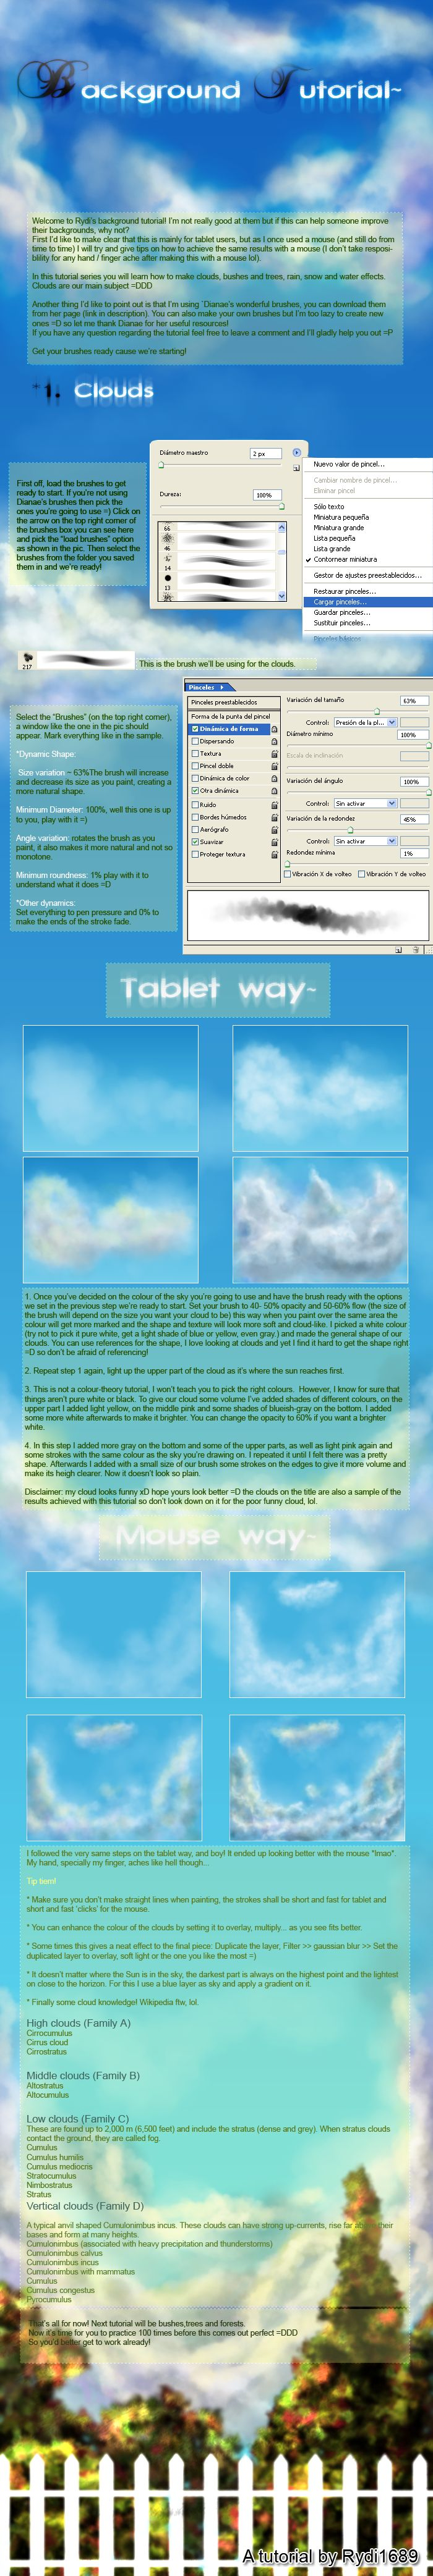 30 Free High-Resolution Photoshop Brush Sets